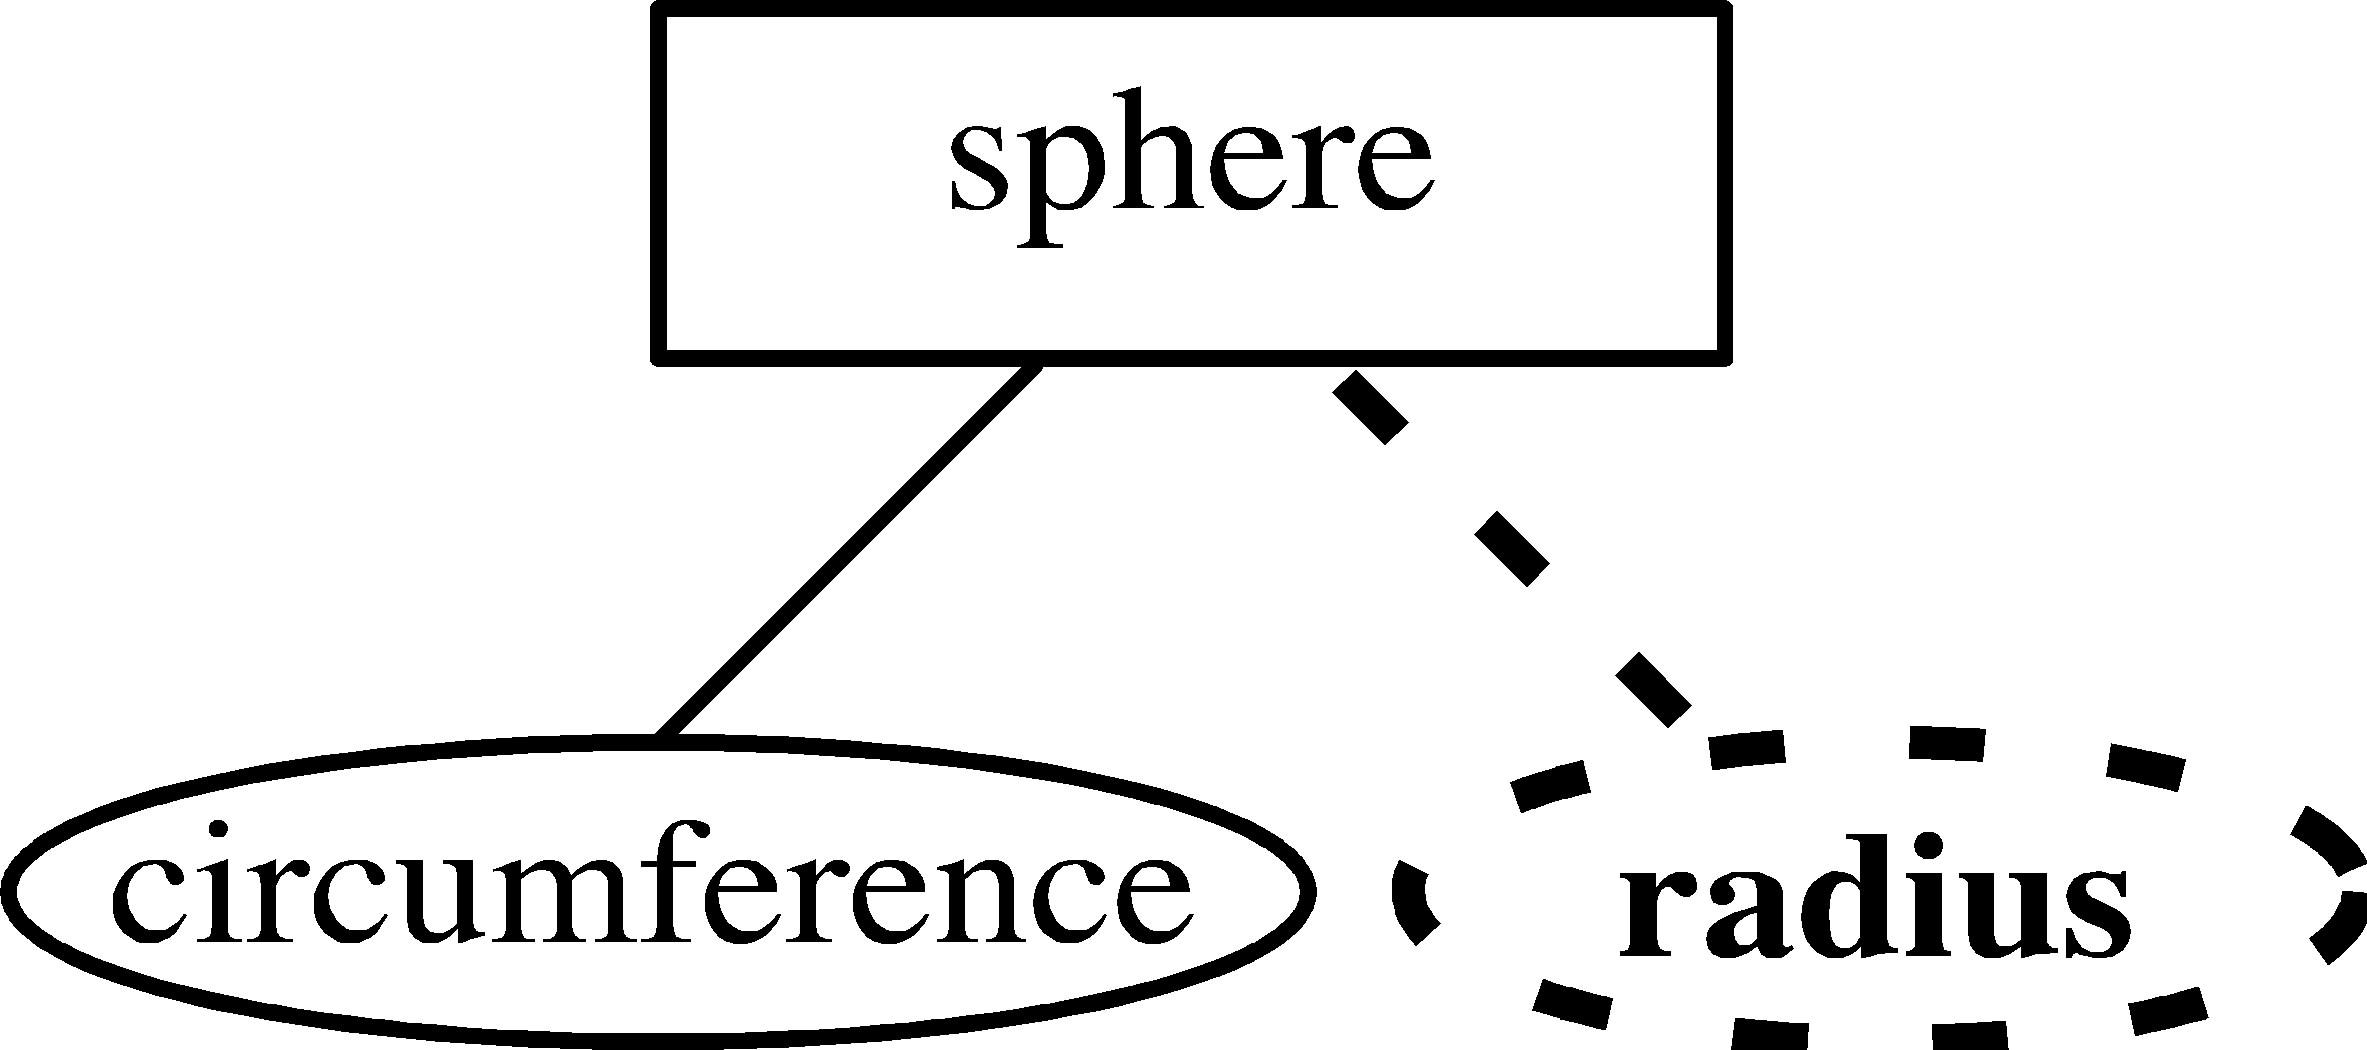 Entity-Relationship Model within Er Diagram Dotted Underline